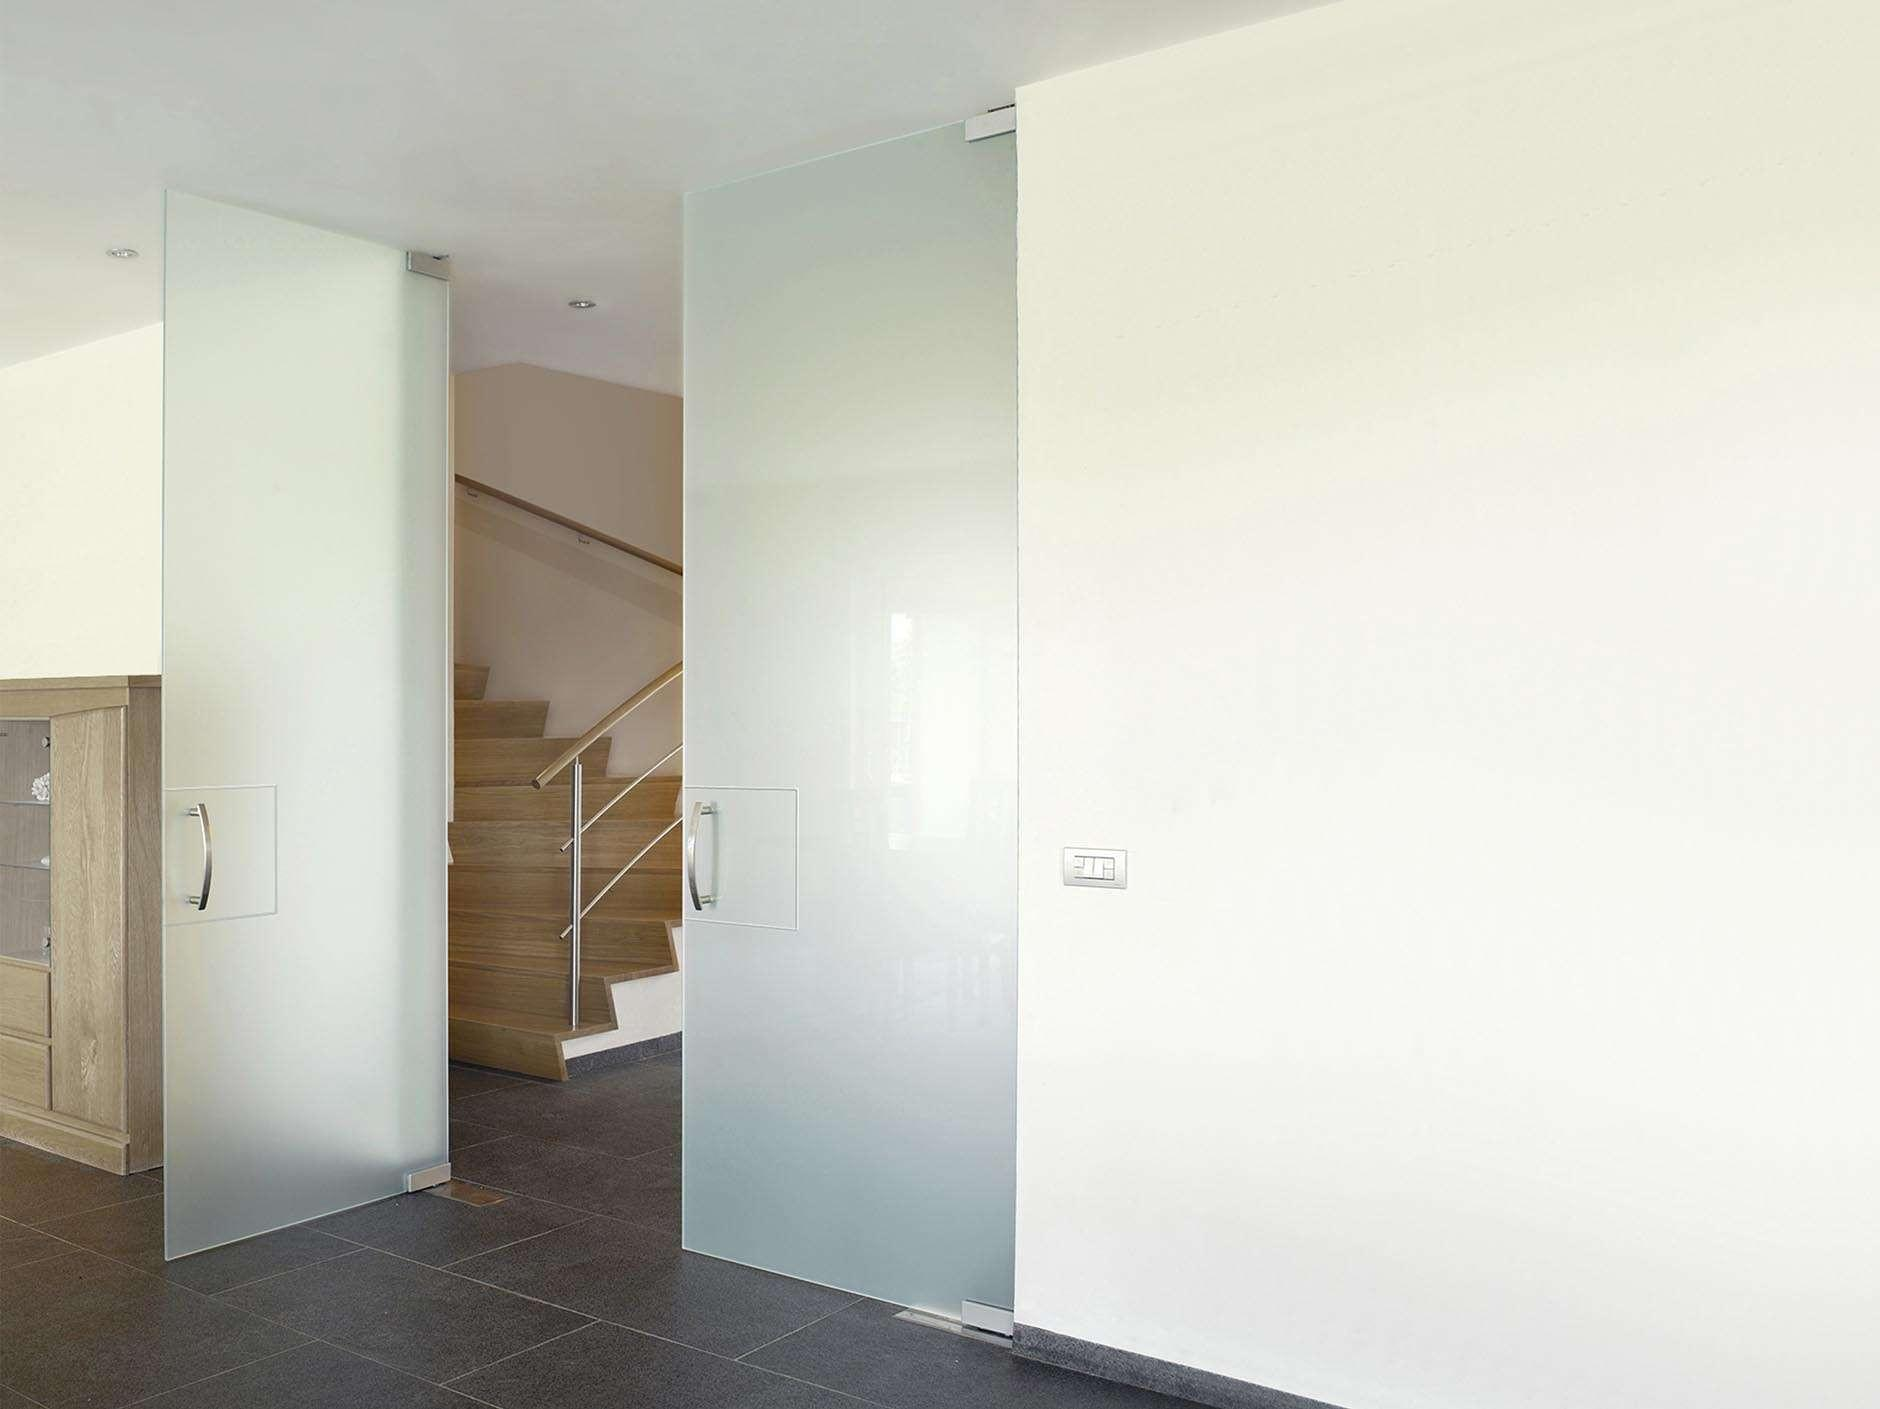 dubbele-glazen-deur-mat